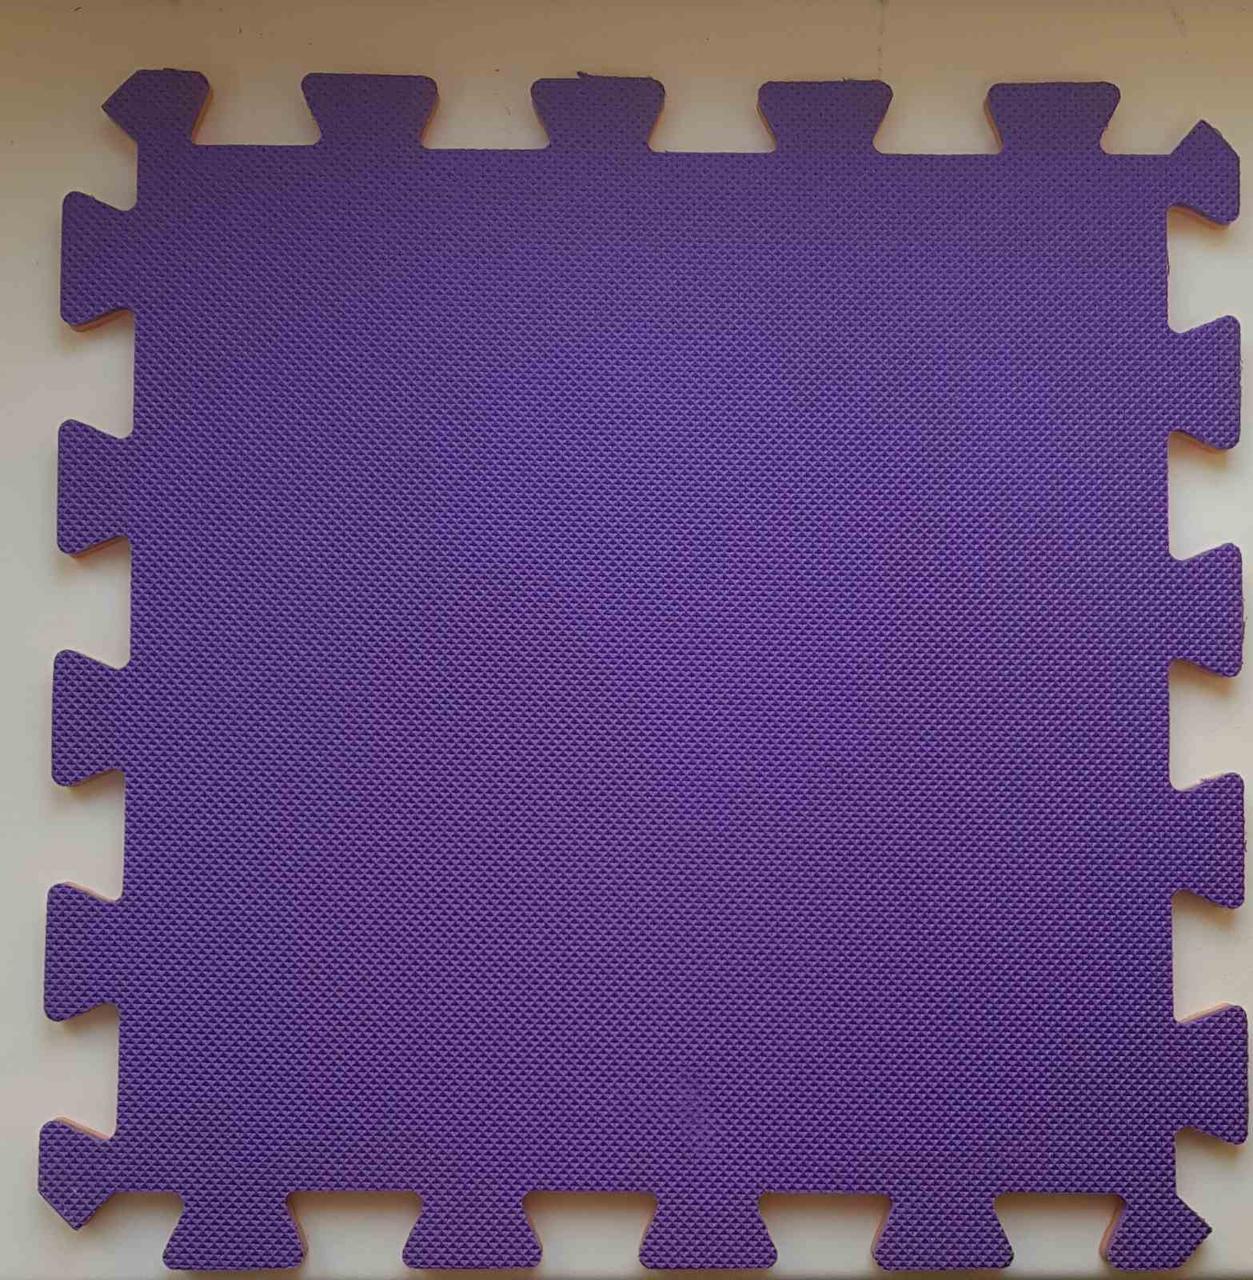 Мягкий пол пазл 300*300*8 мм двухсторонний оранжево-фиолетовый